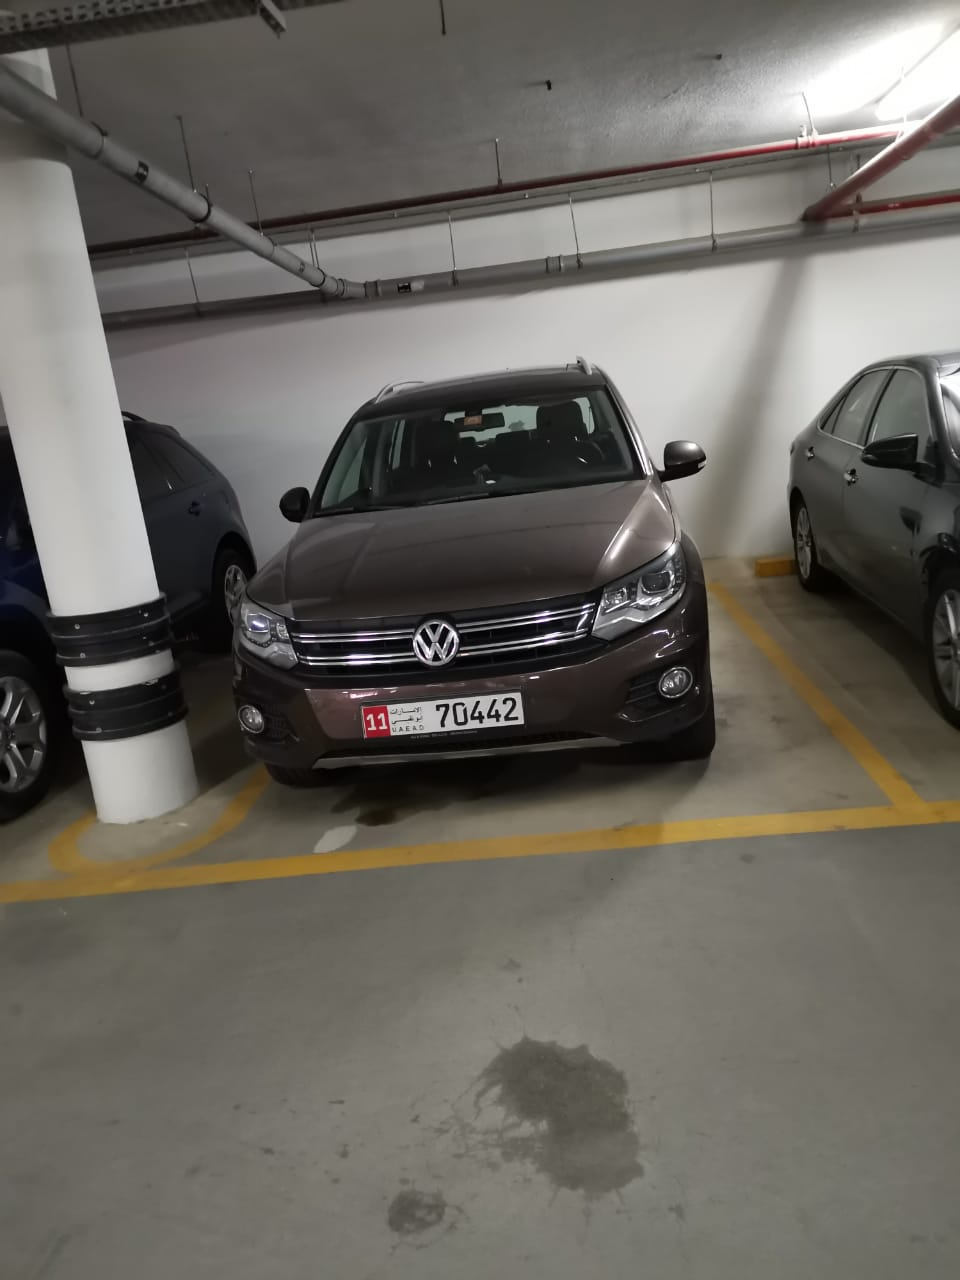 Volkswagen Tiguan 2012 excellent condition for Sale in Dubsai - Image 1